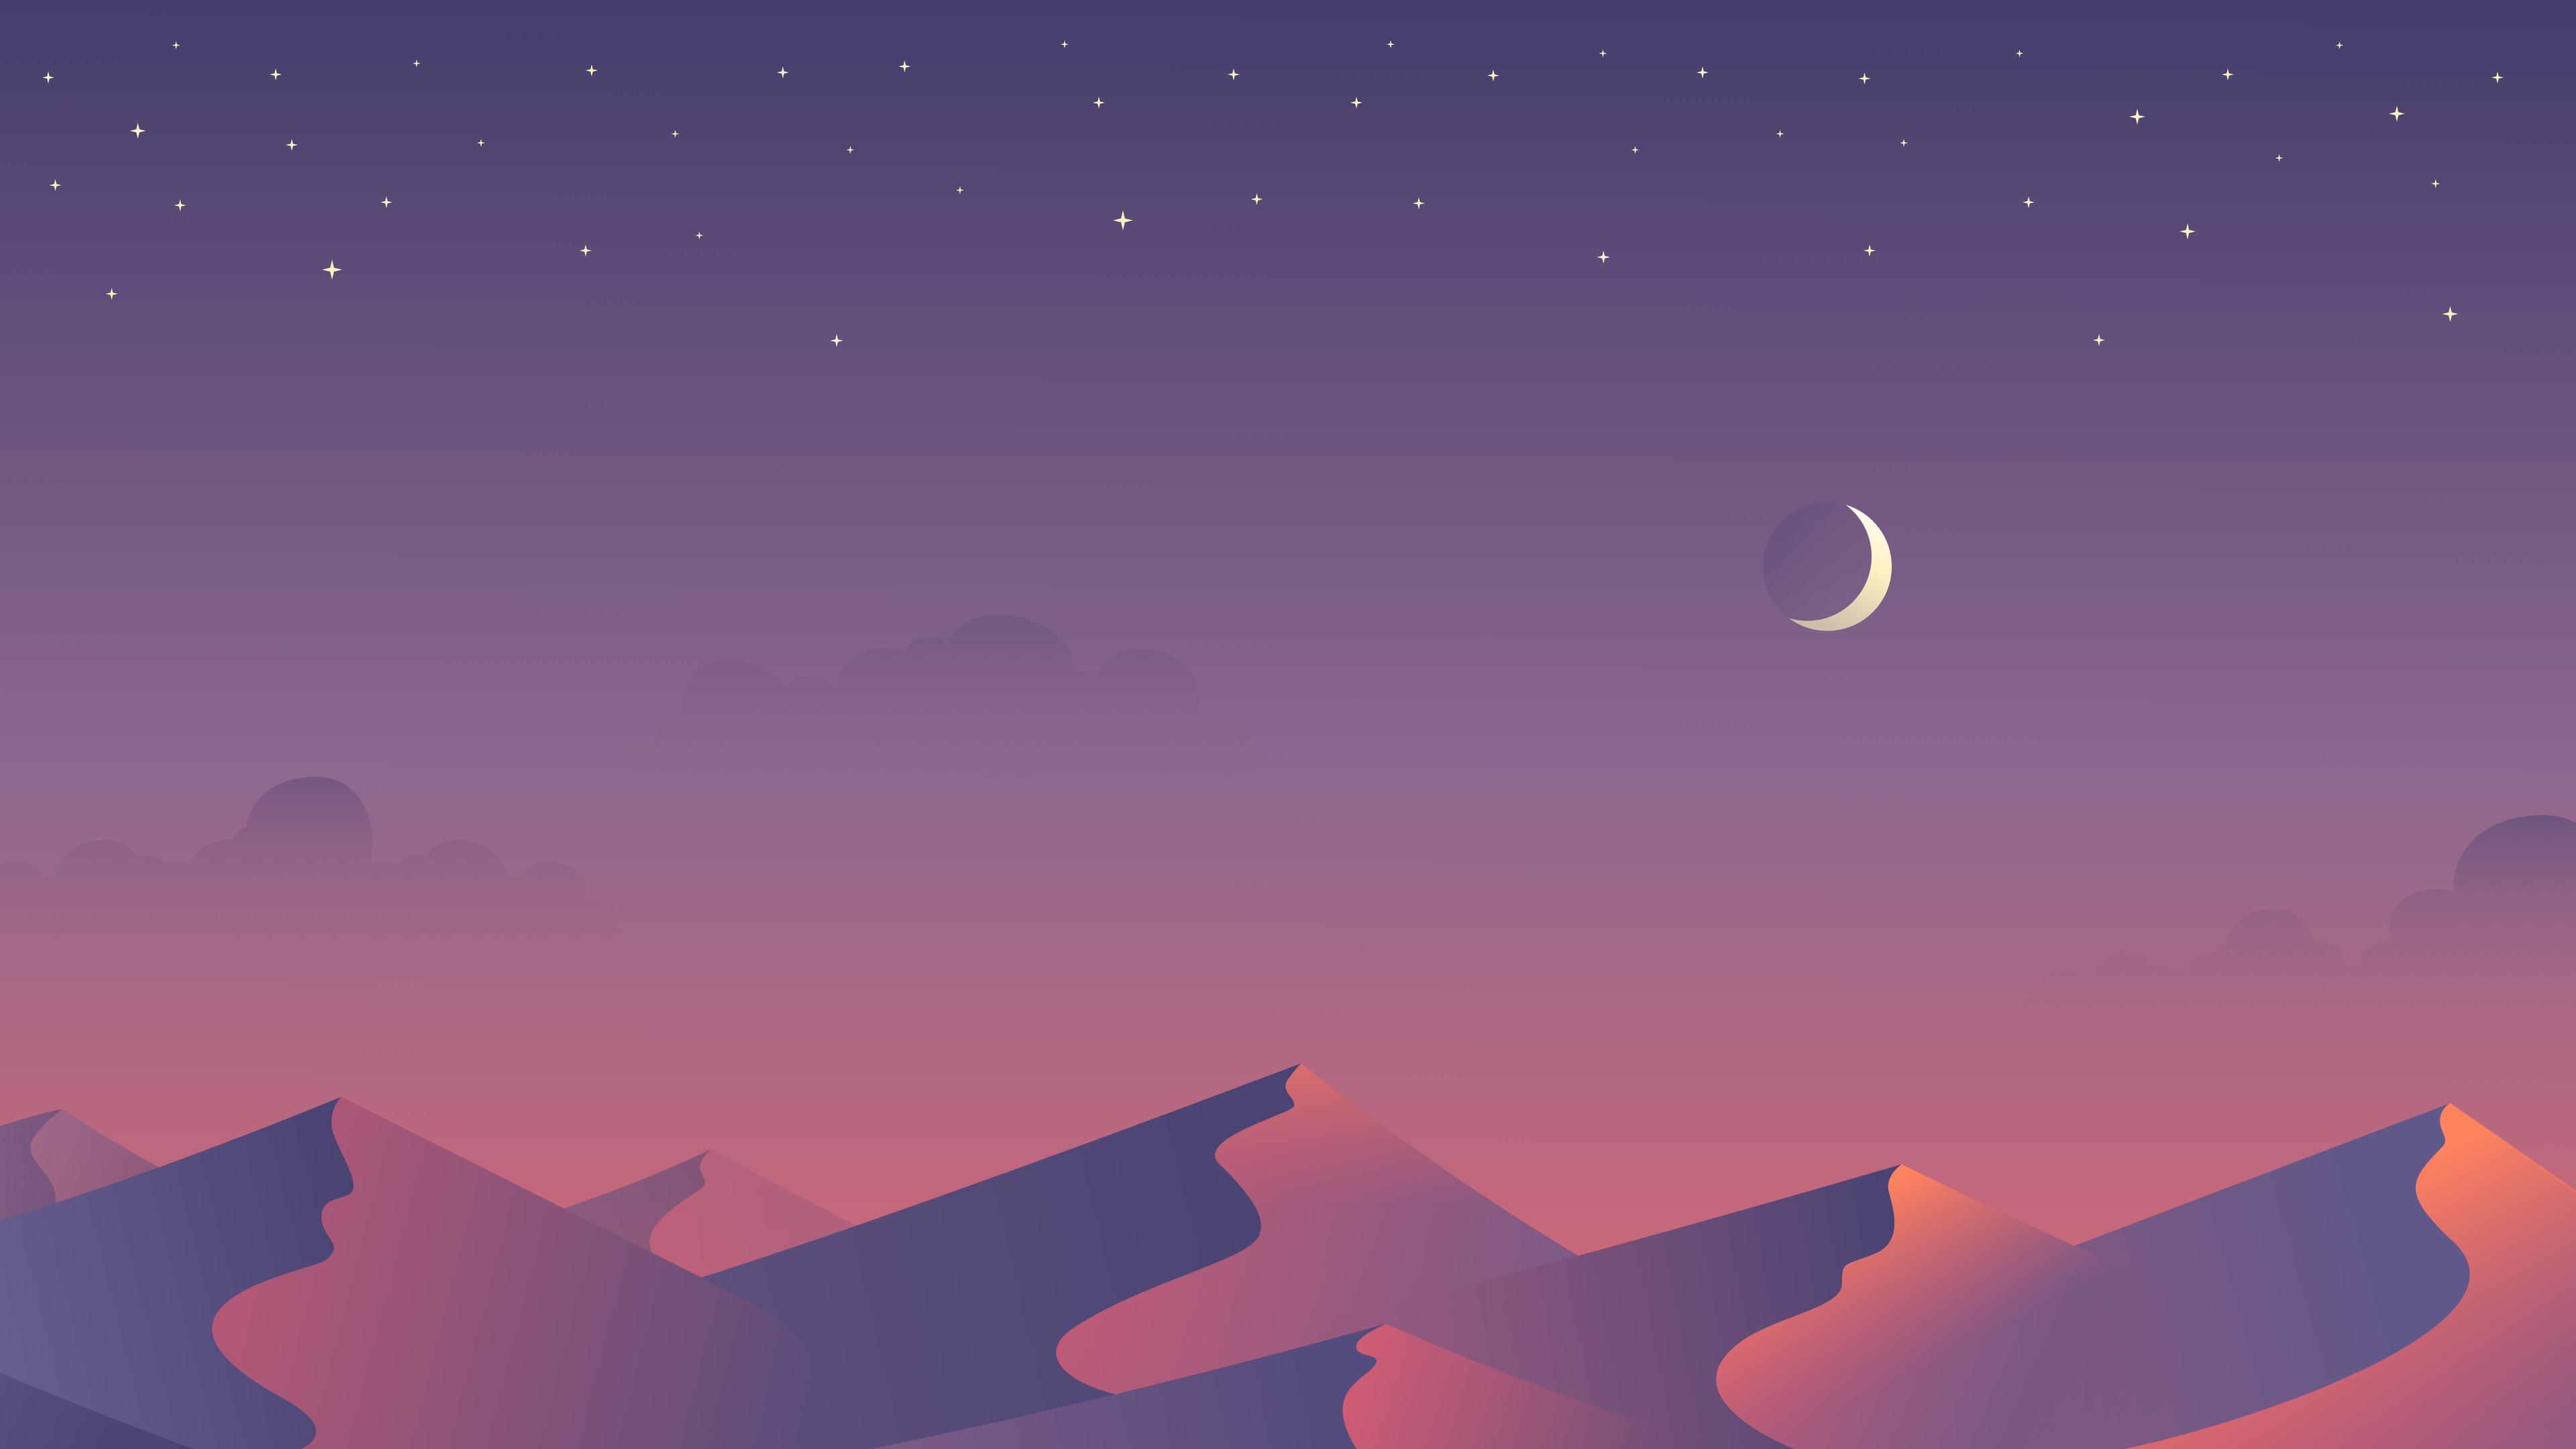 desert nights moon 4k minimalism 1540749702 - Desert Nights Moon 4k Minimalism - sun wallpapers, moon wallpapers, minimalism wallpapers, hd-wallpapers, digital art wallpapers, desert wallpapers, artwork wallpapers, artist wallpapers, 5k wallpapers, 4k-wallpapers